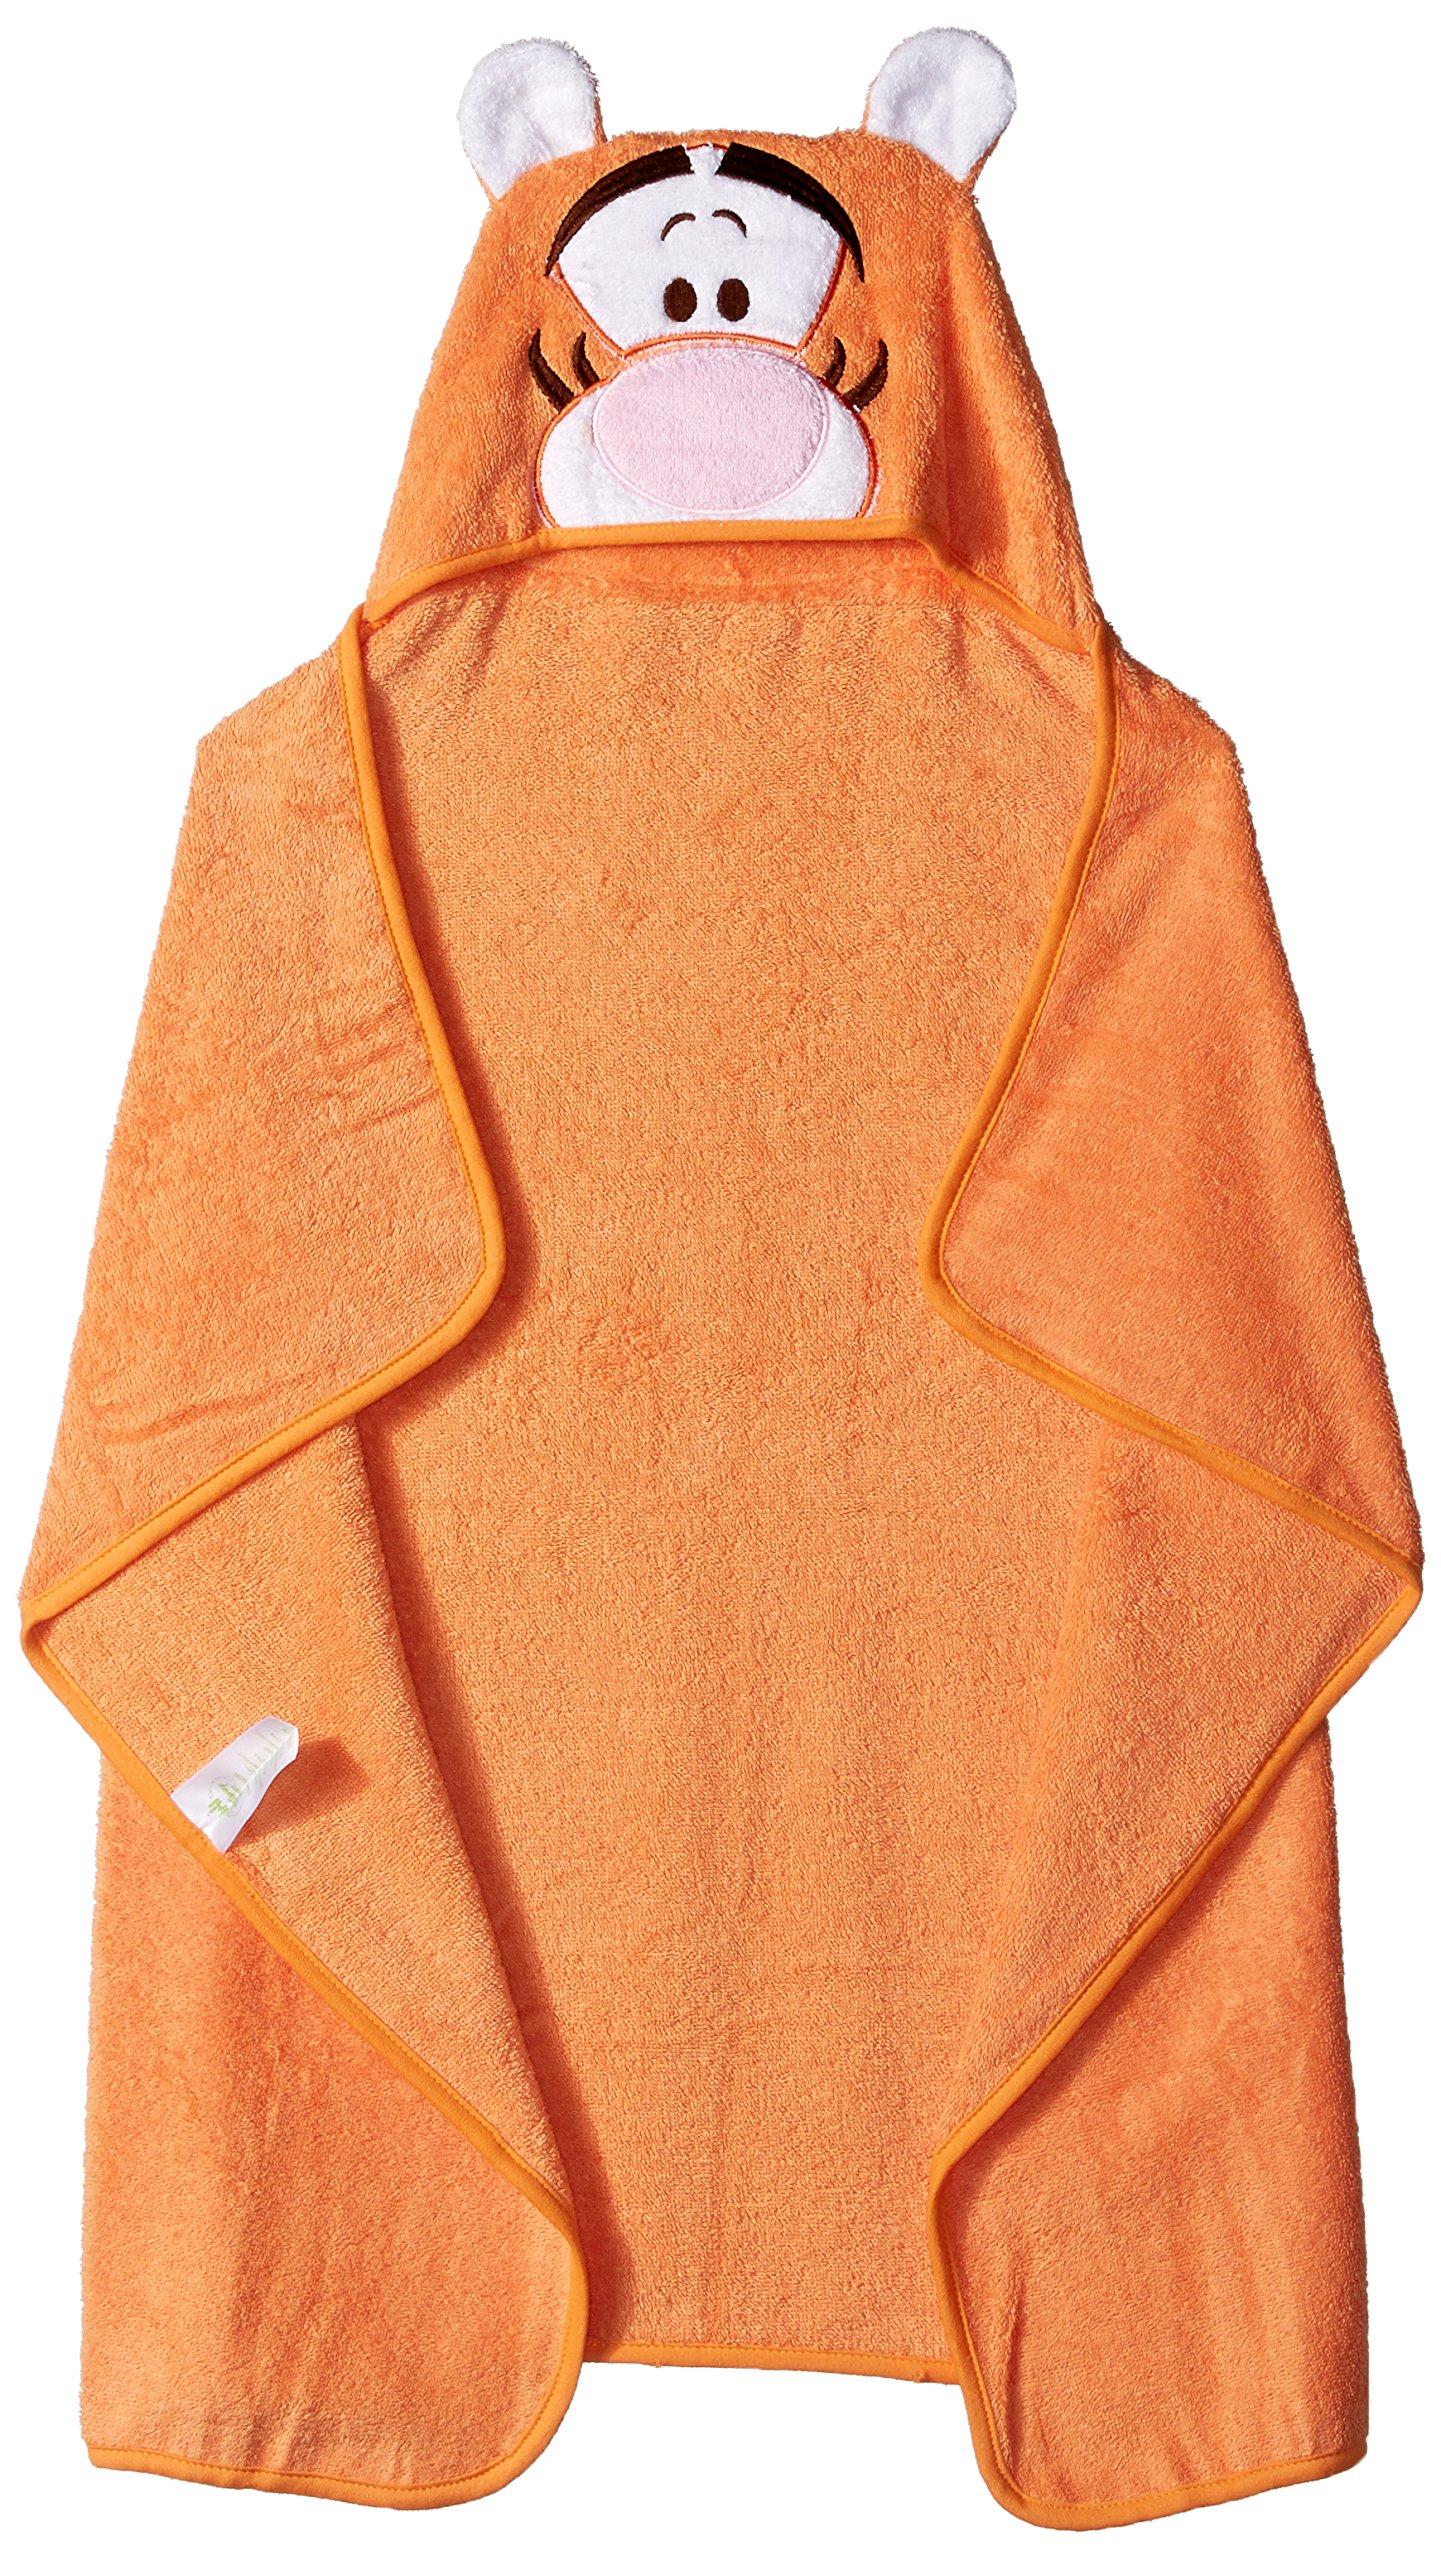 Disney Baby TIGGER Puppet Hooded Towel, Orange